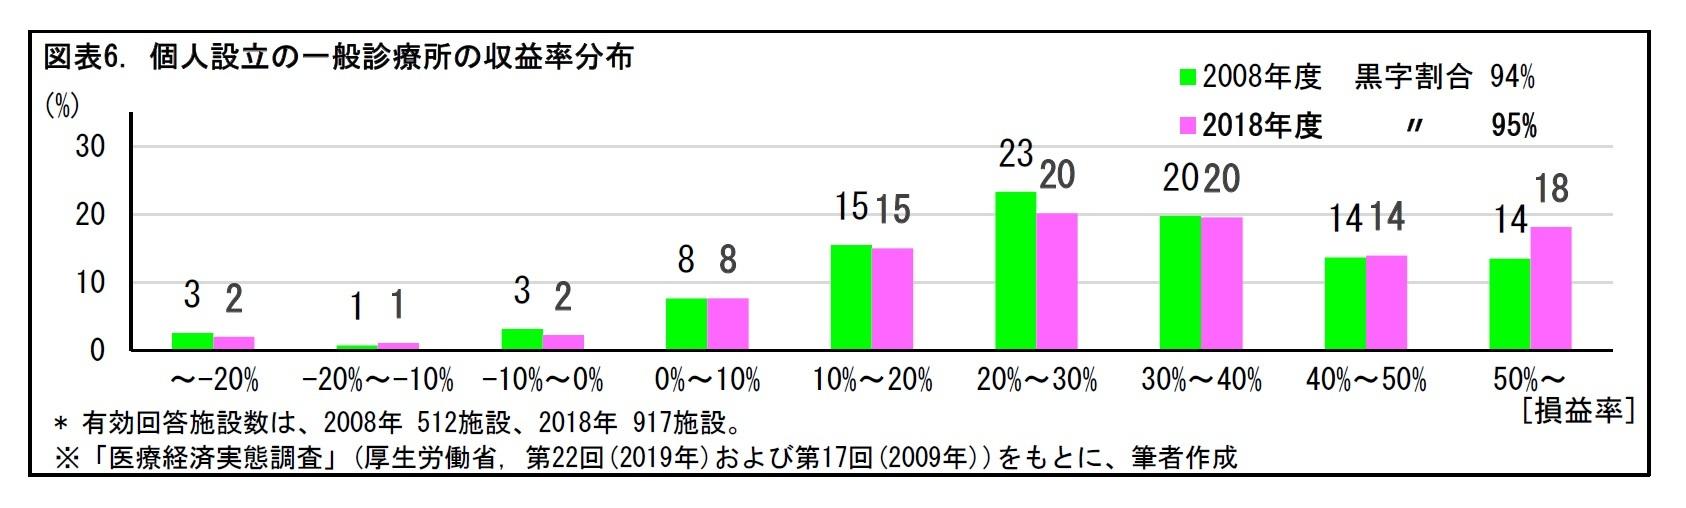 図表6. 個人設立の一般診療所の収益率分布